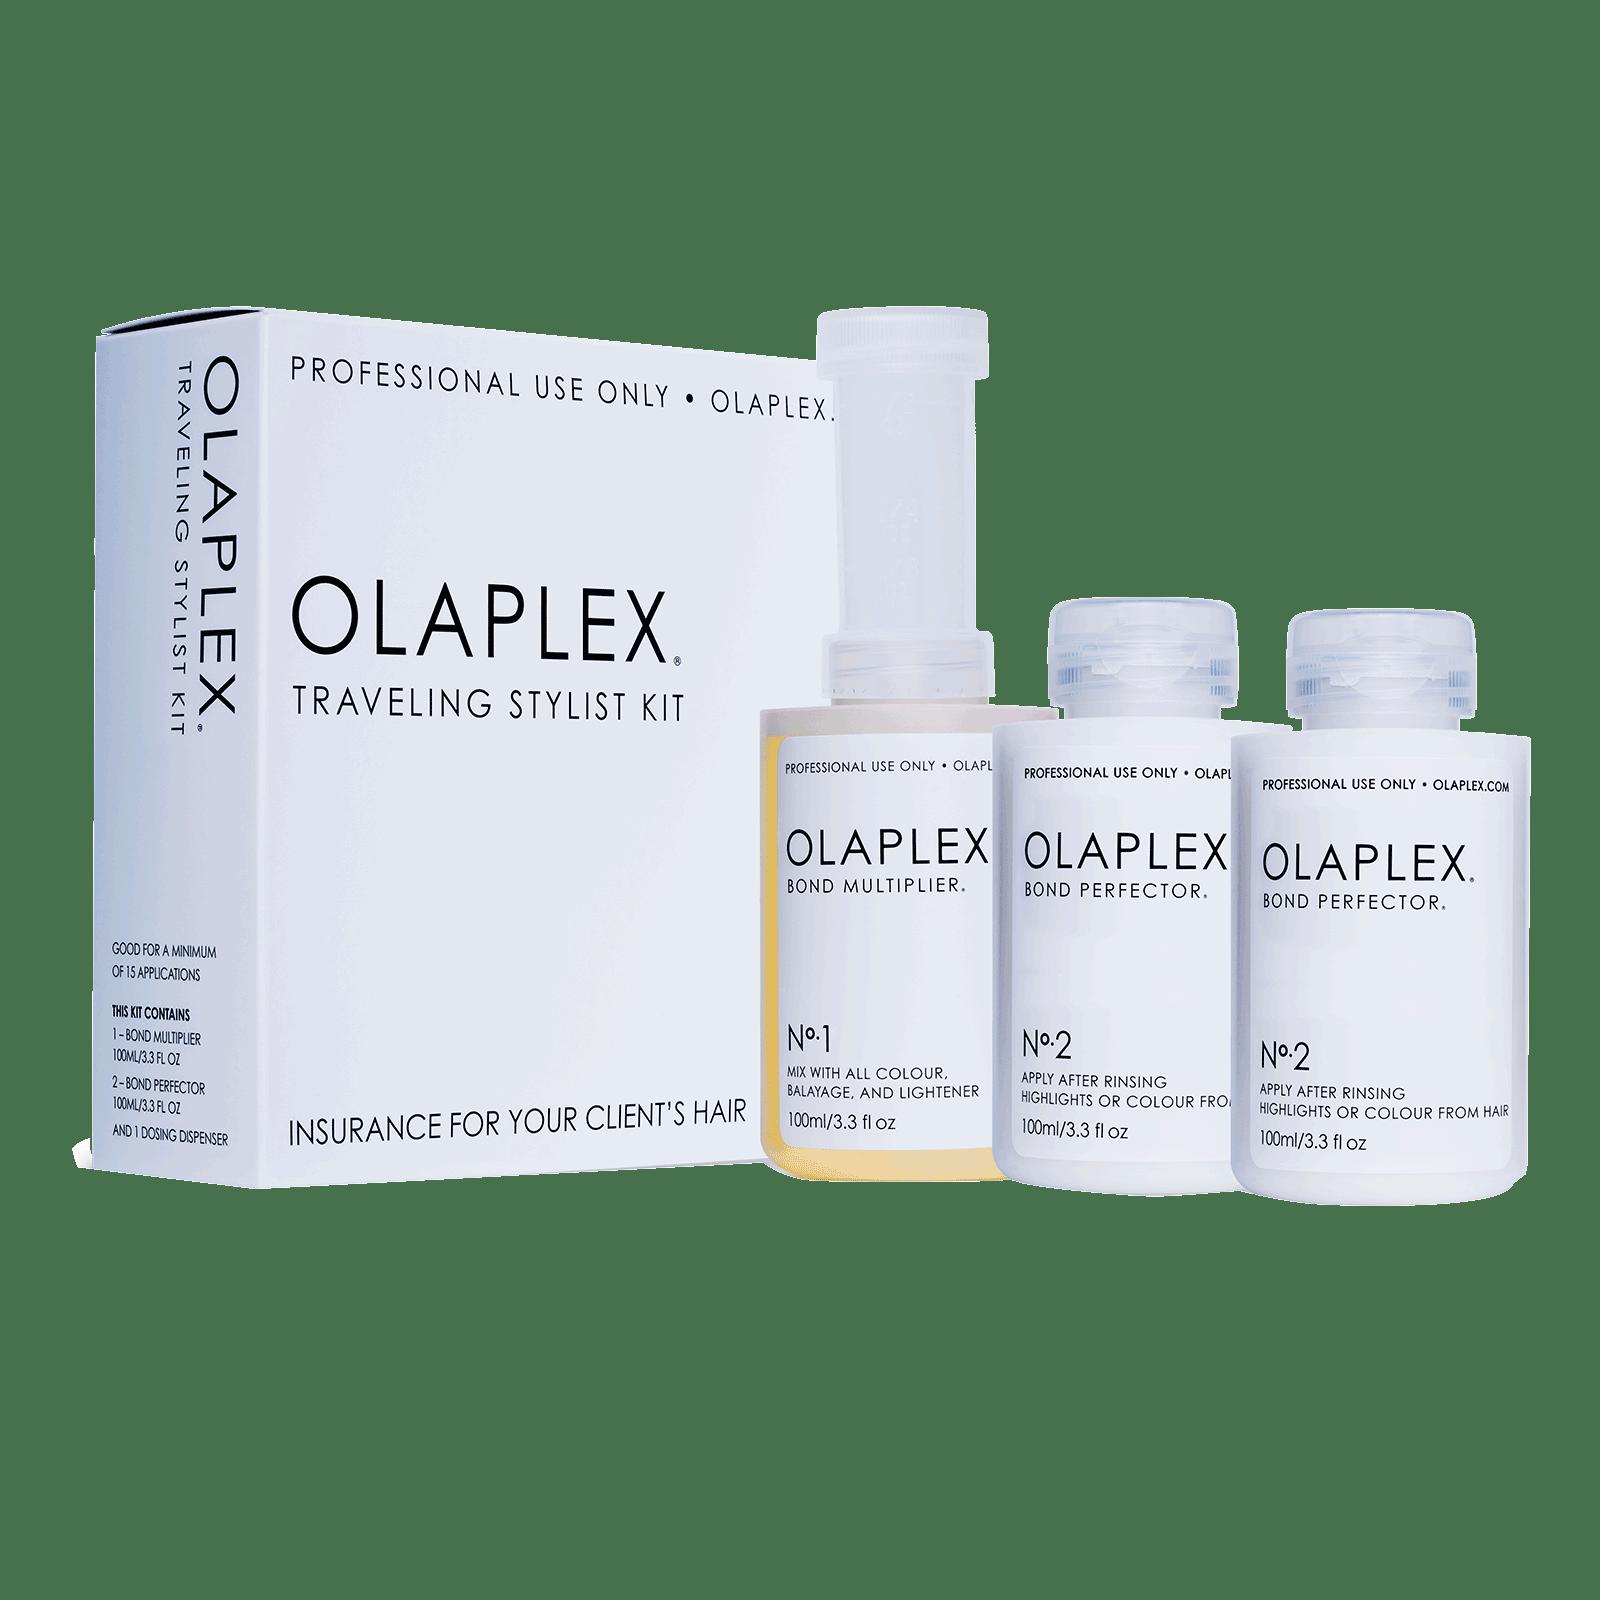 Olaplex Traveling Stylist Kit   cosmeticworld.ca